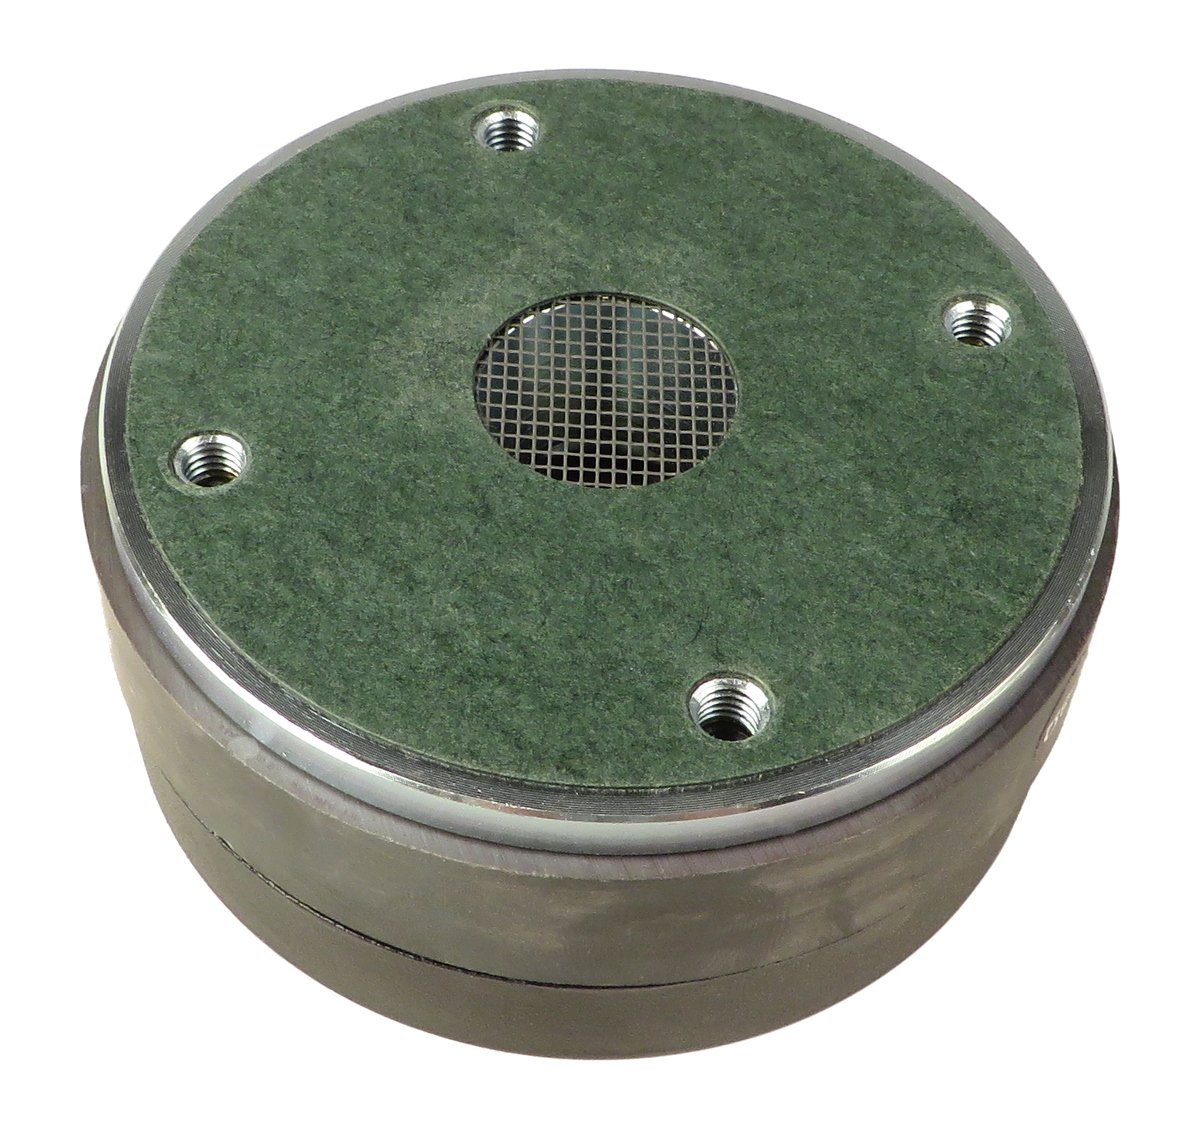 "EAW-Eastern Acoustic Wrks 2037612 1"" HF Driver for VFM129 and VFM159i 2037612"